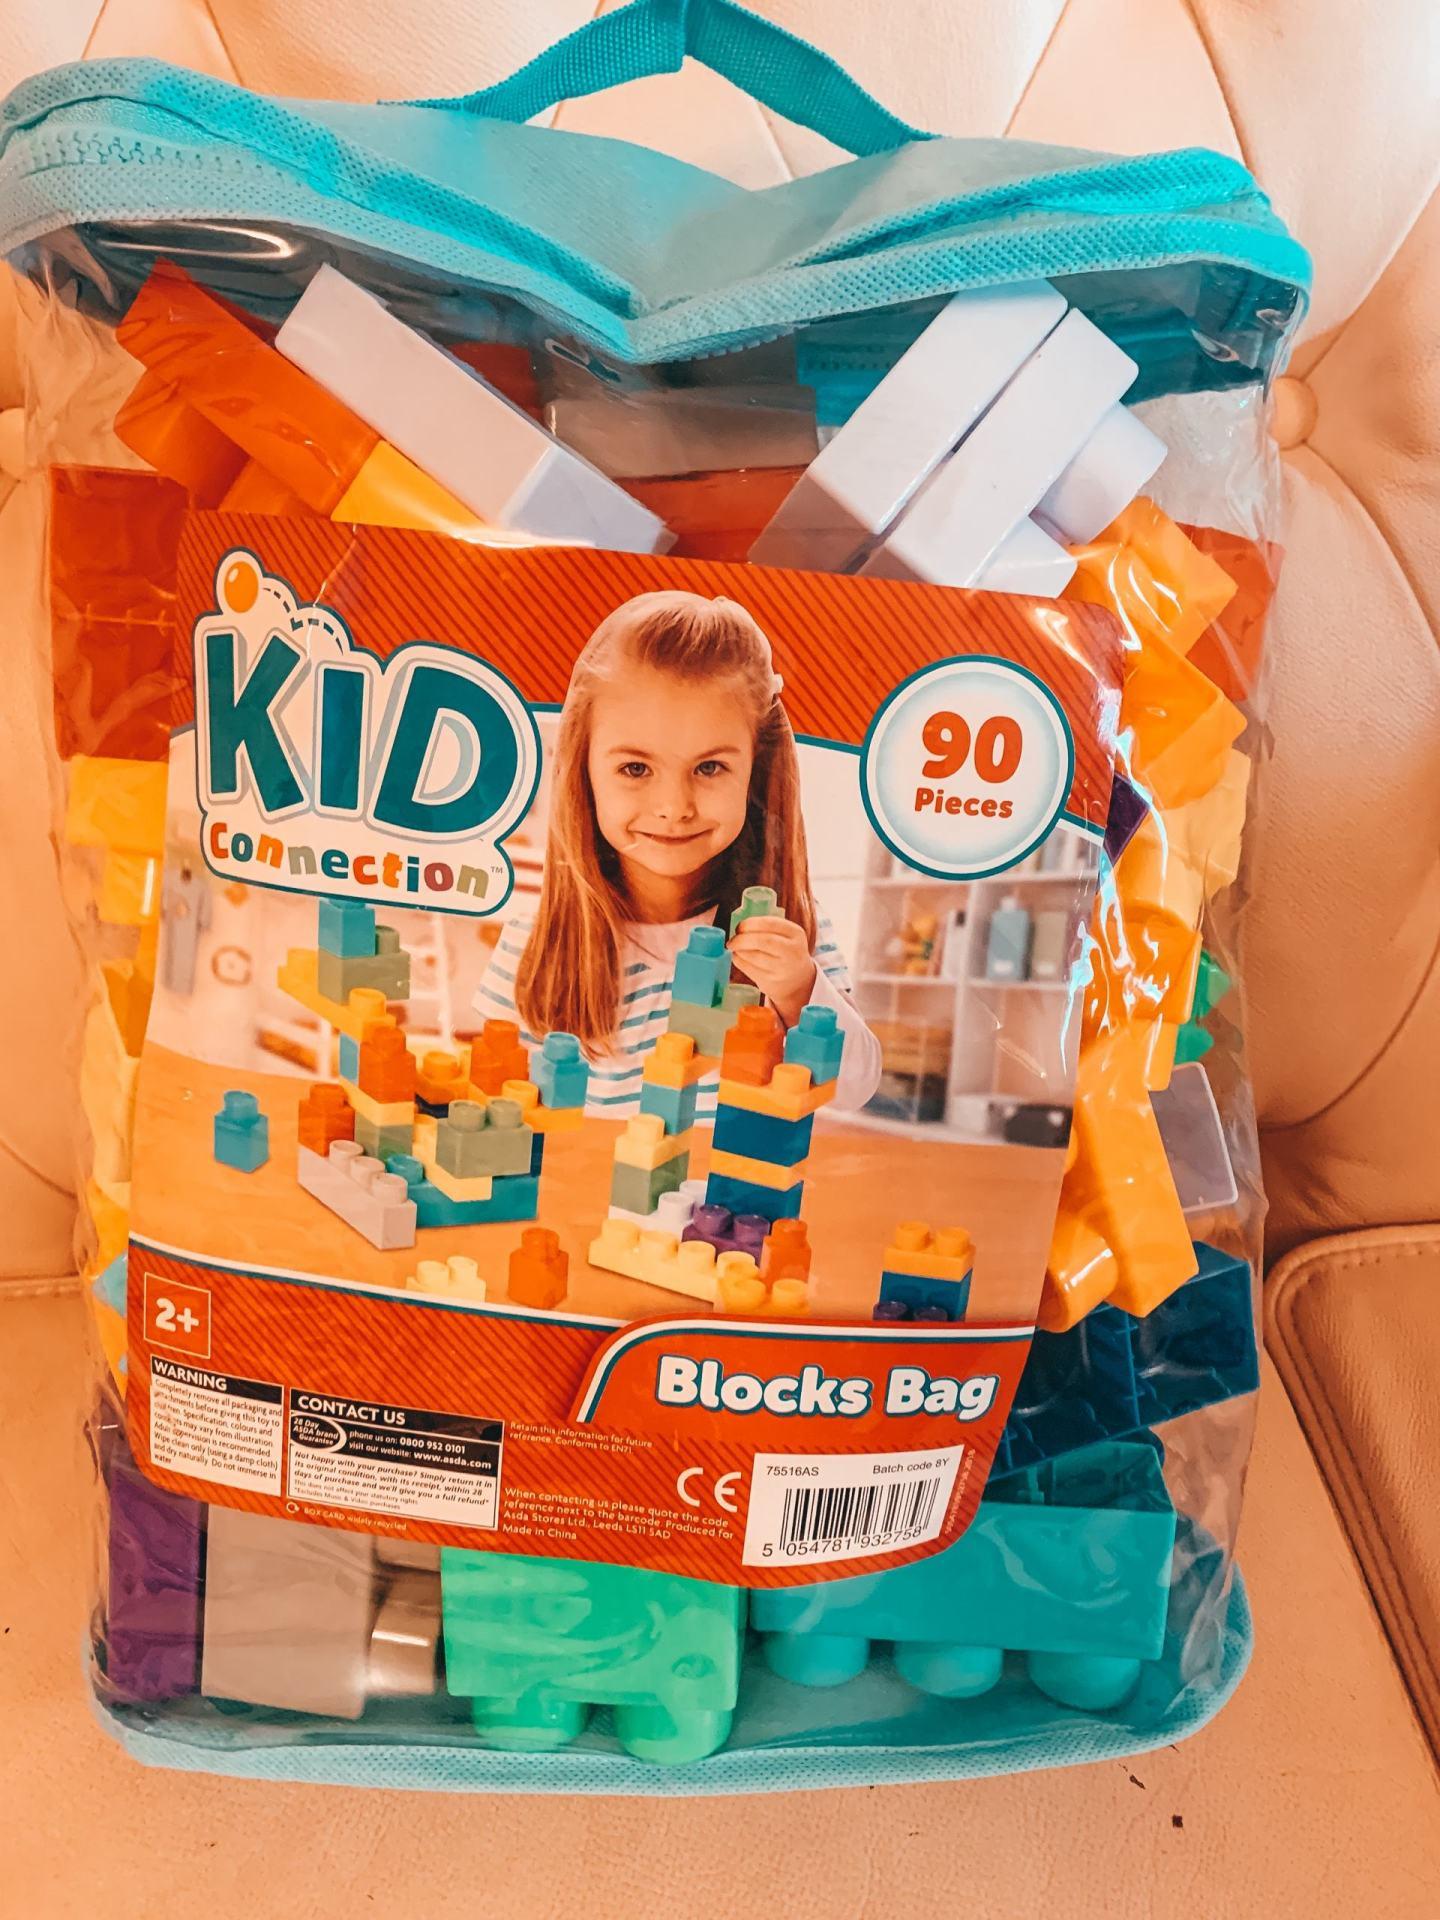 amazon-building-blocks-keep-kids-busy-social-distancing-www.stylinglifetoday.com